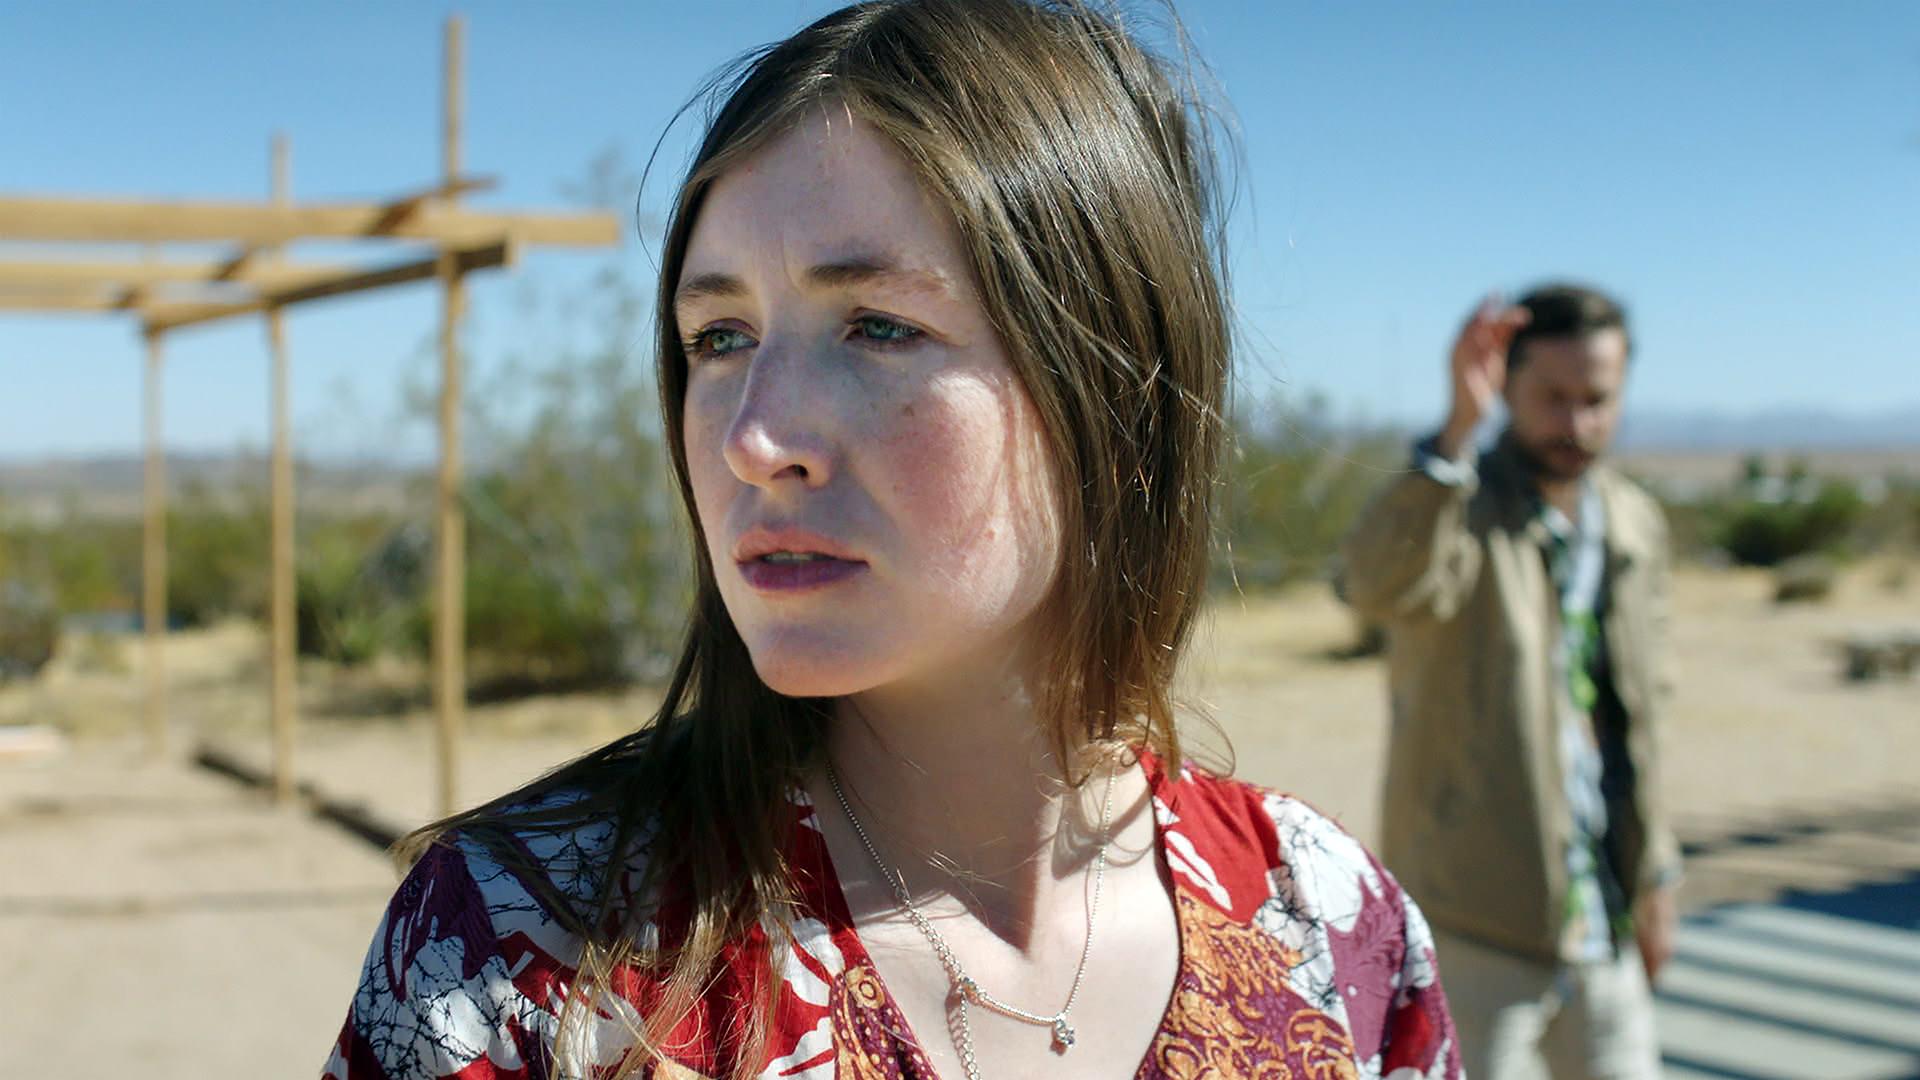 Kate Lyn Sheil in Amy Seimetz's 'She Dies Tomorrow'